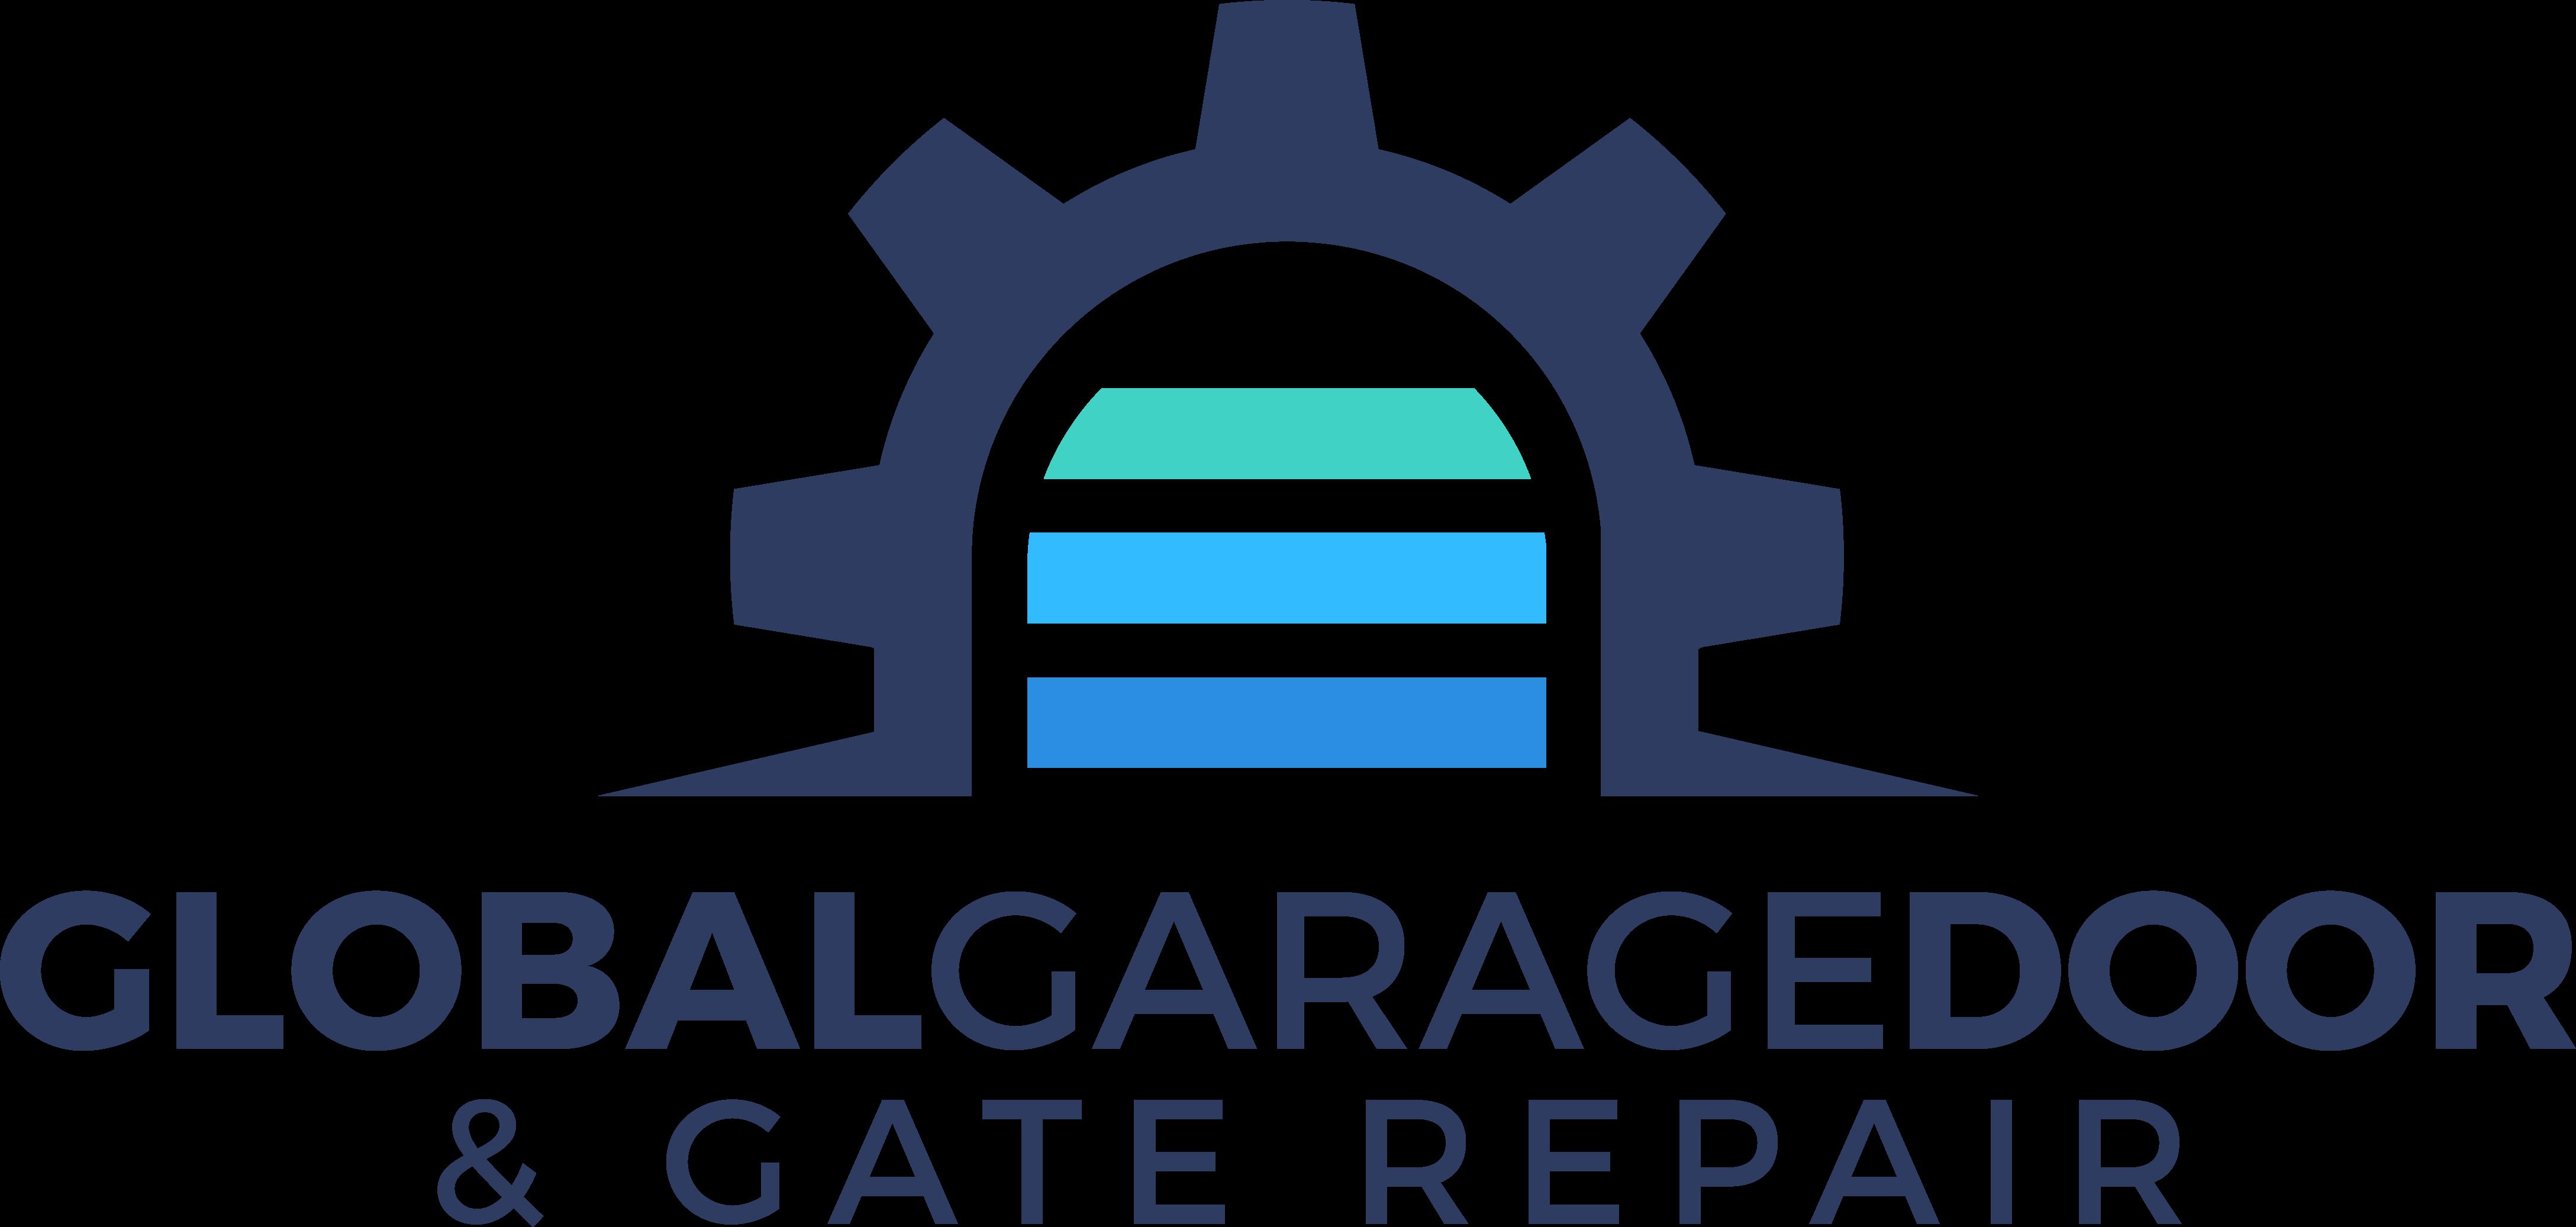 Global Garage Door & Gate Repair is a Leading Garage Door Repair Company in Roseville, CA